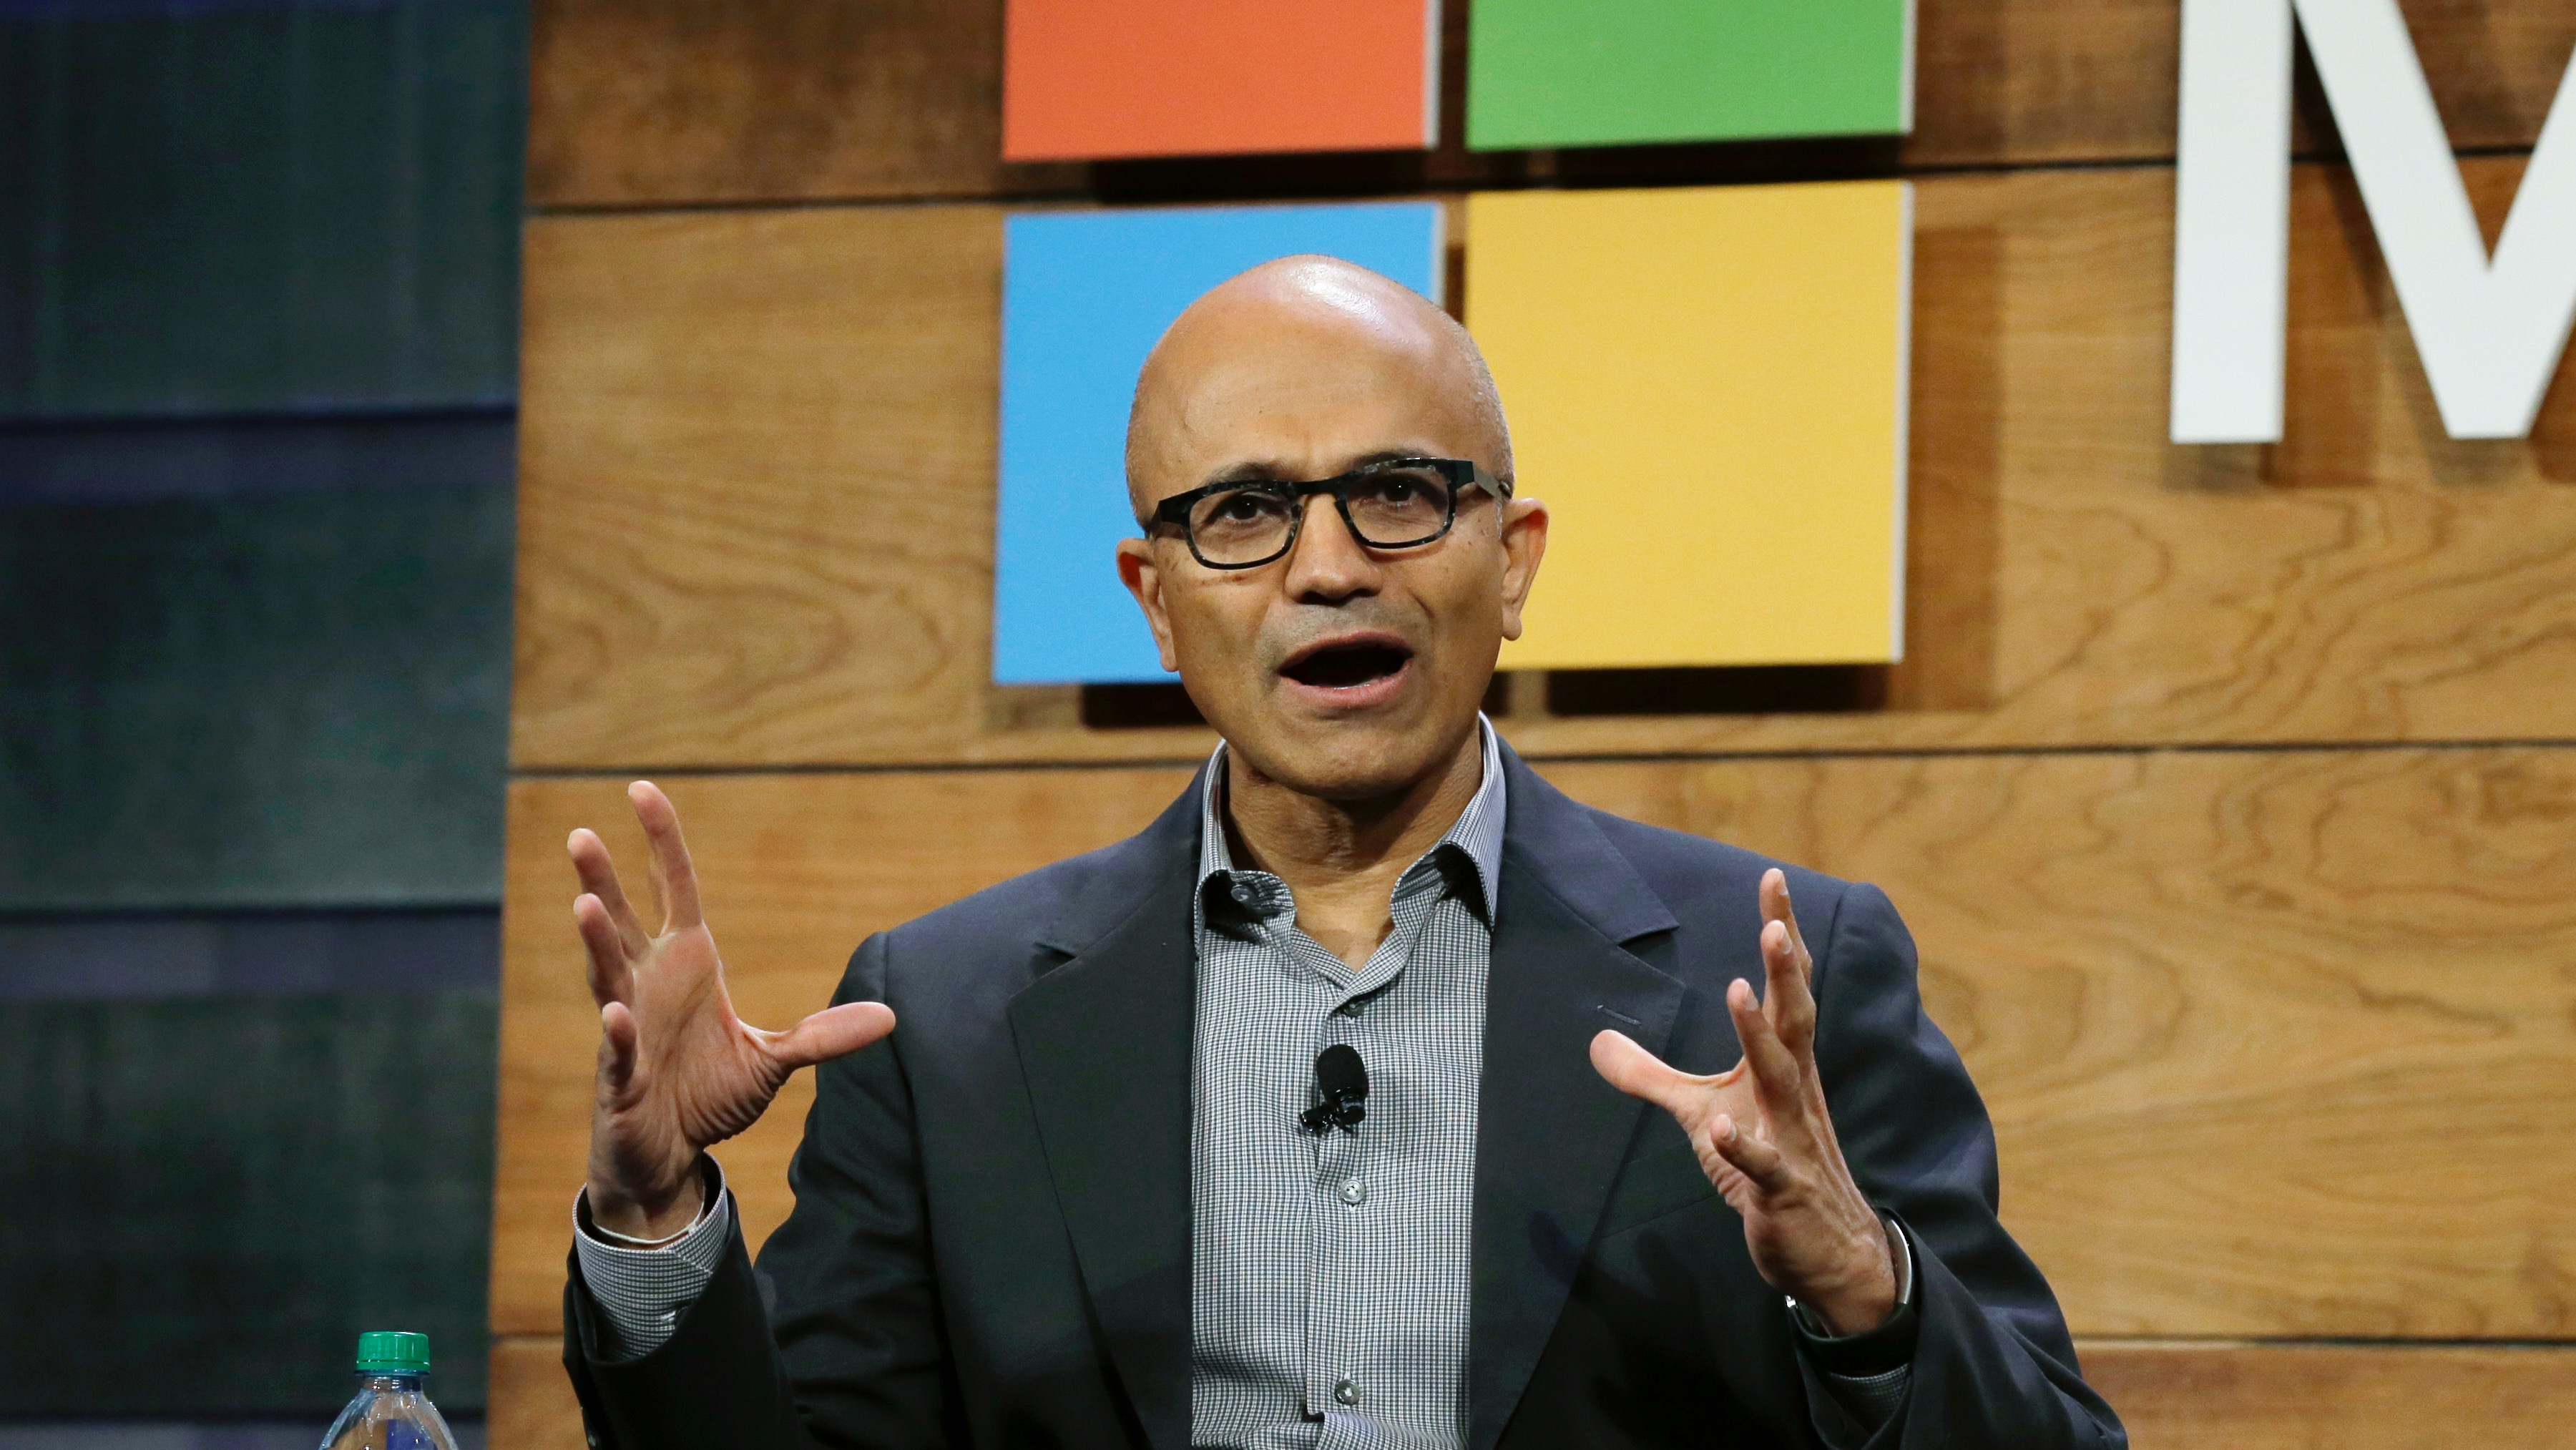 Microsoft Corp. CEO Satya Nadella speaks Wednesday, Dec. 2, 2015, at Microsoft's annual shareholders meeting in Bellevue, Wash. (AP Photo/Ted S. Warren)